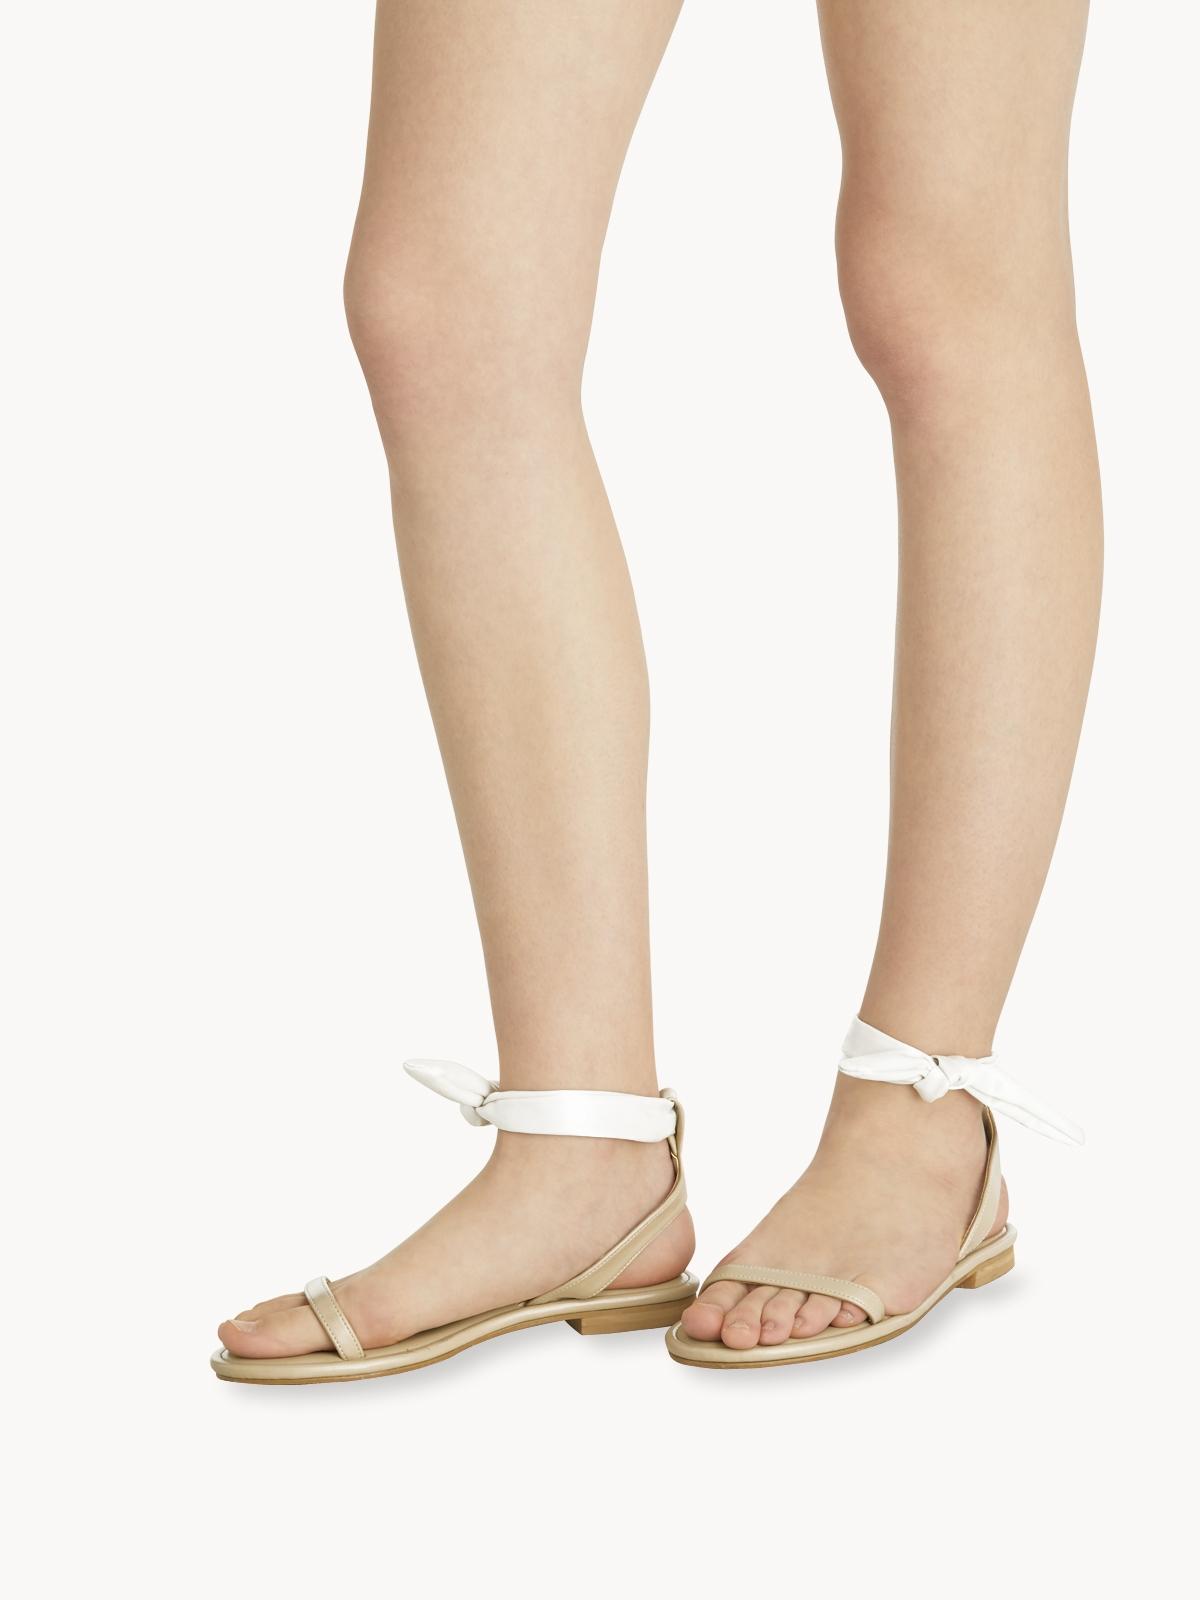 Plush Studios Lyla Sandals Nude